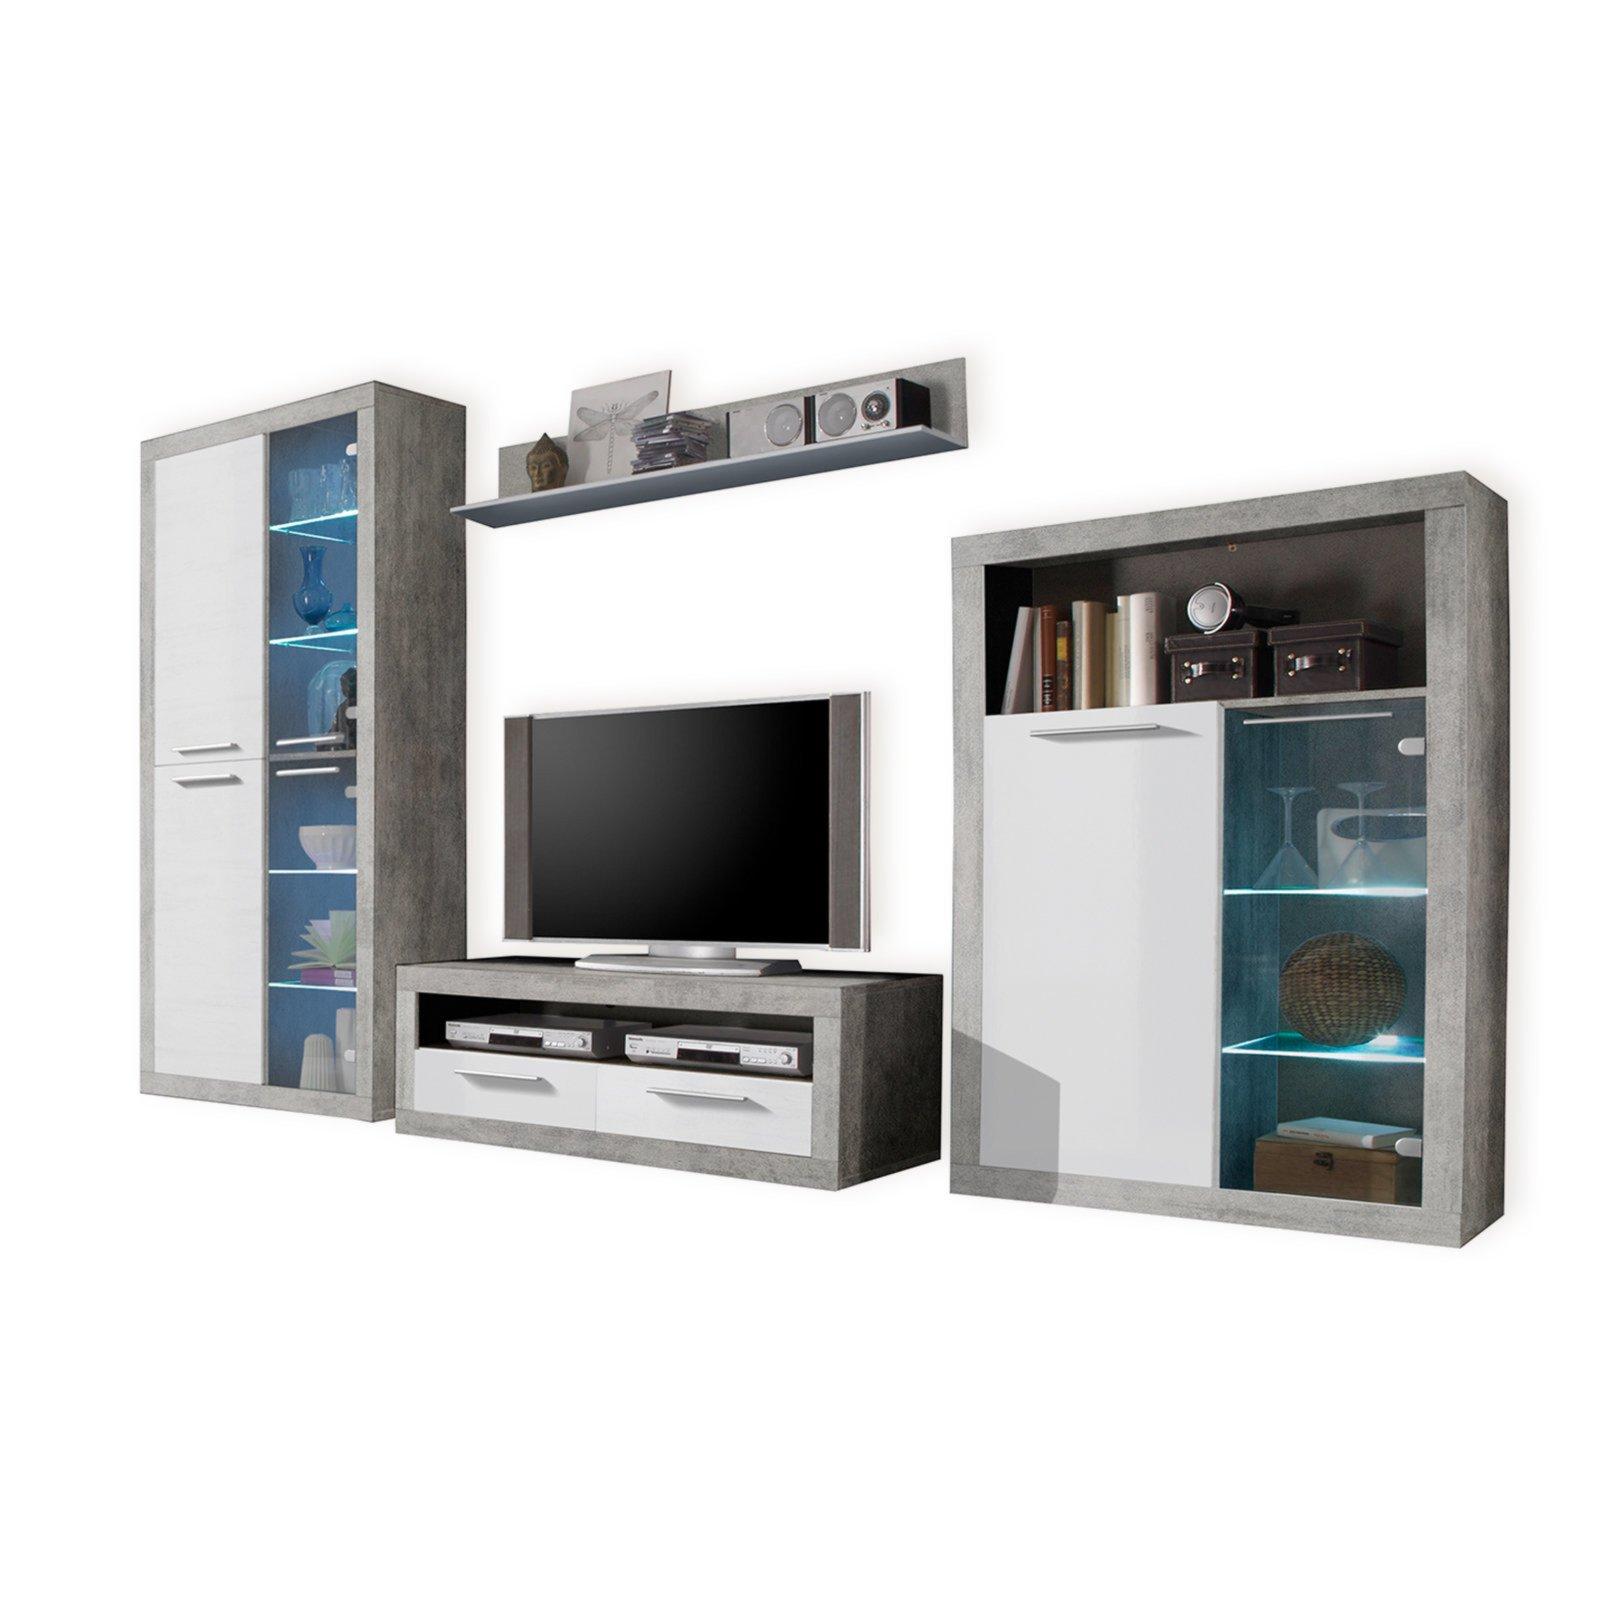 hochglanz wohnwand grau preisvergleiche. Black Bedroom Furniture Sets. Home Design Ideas